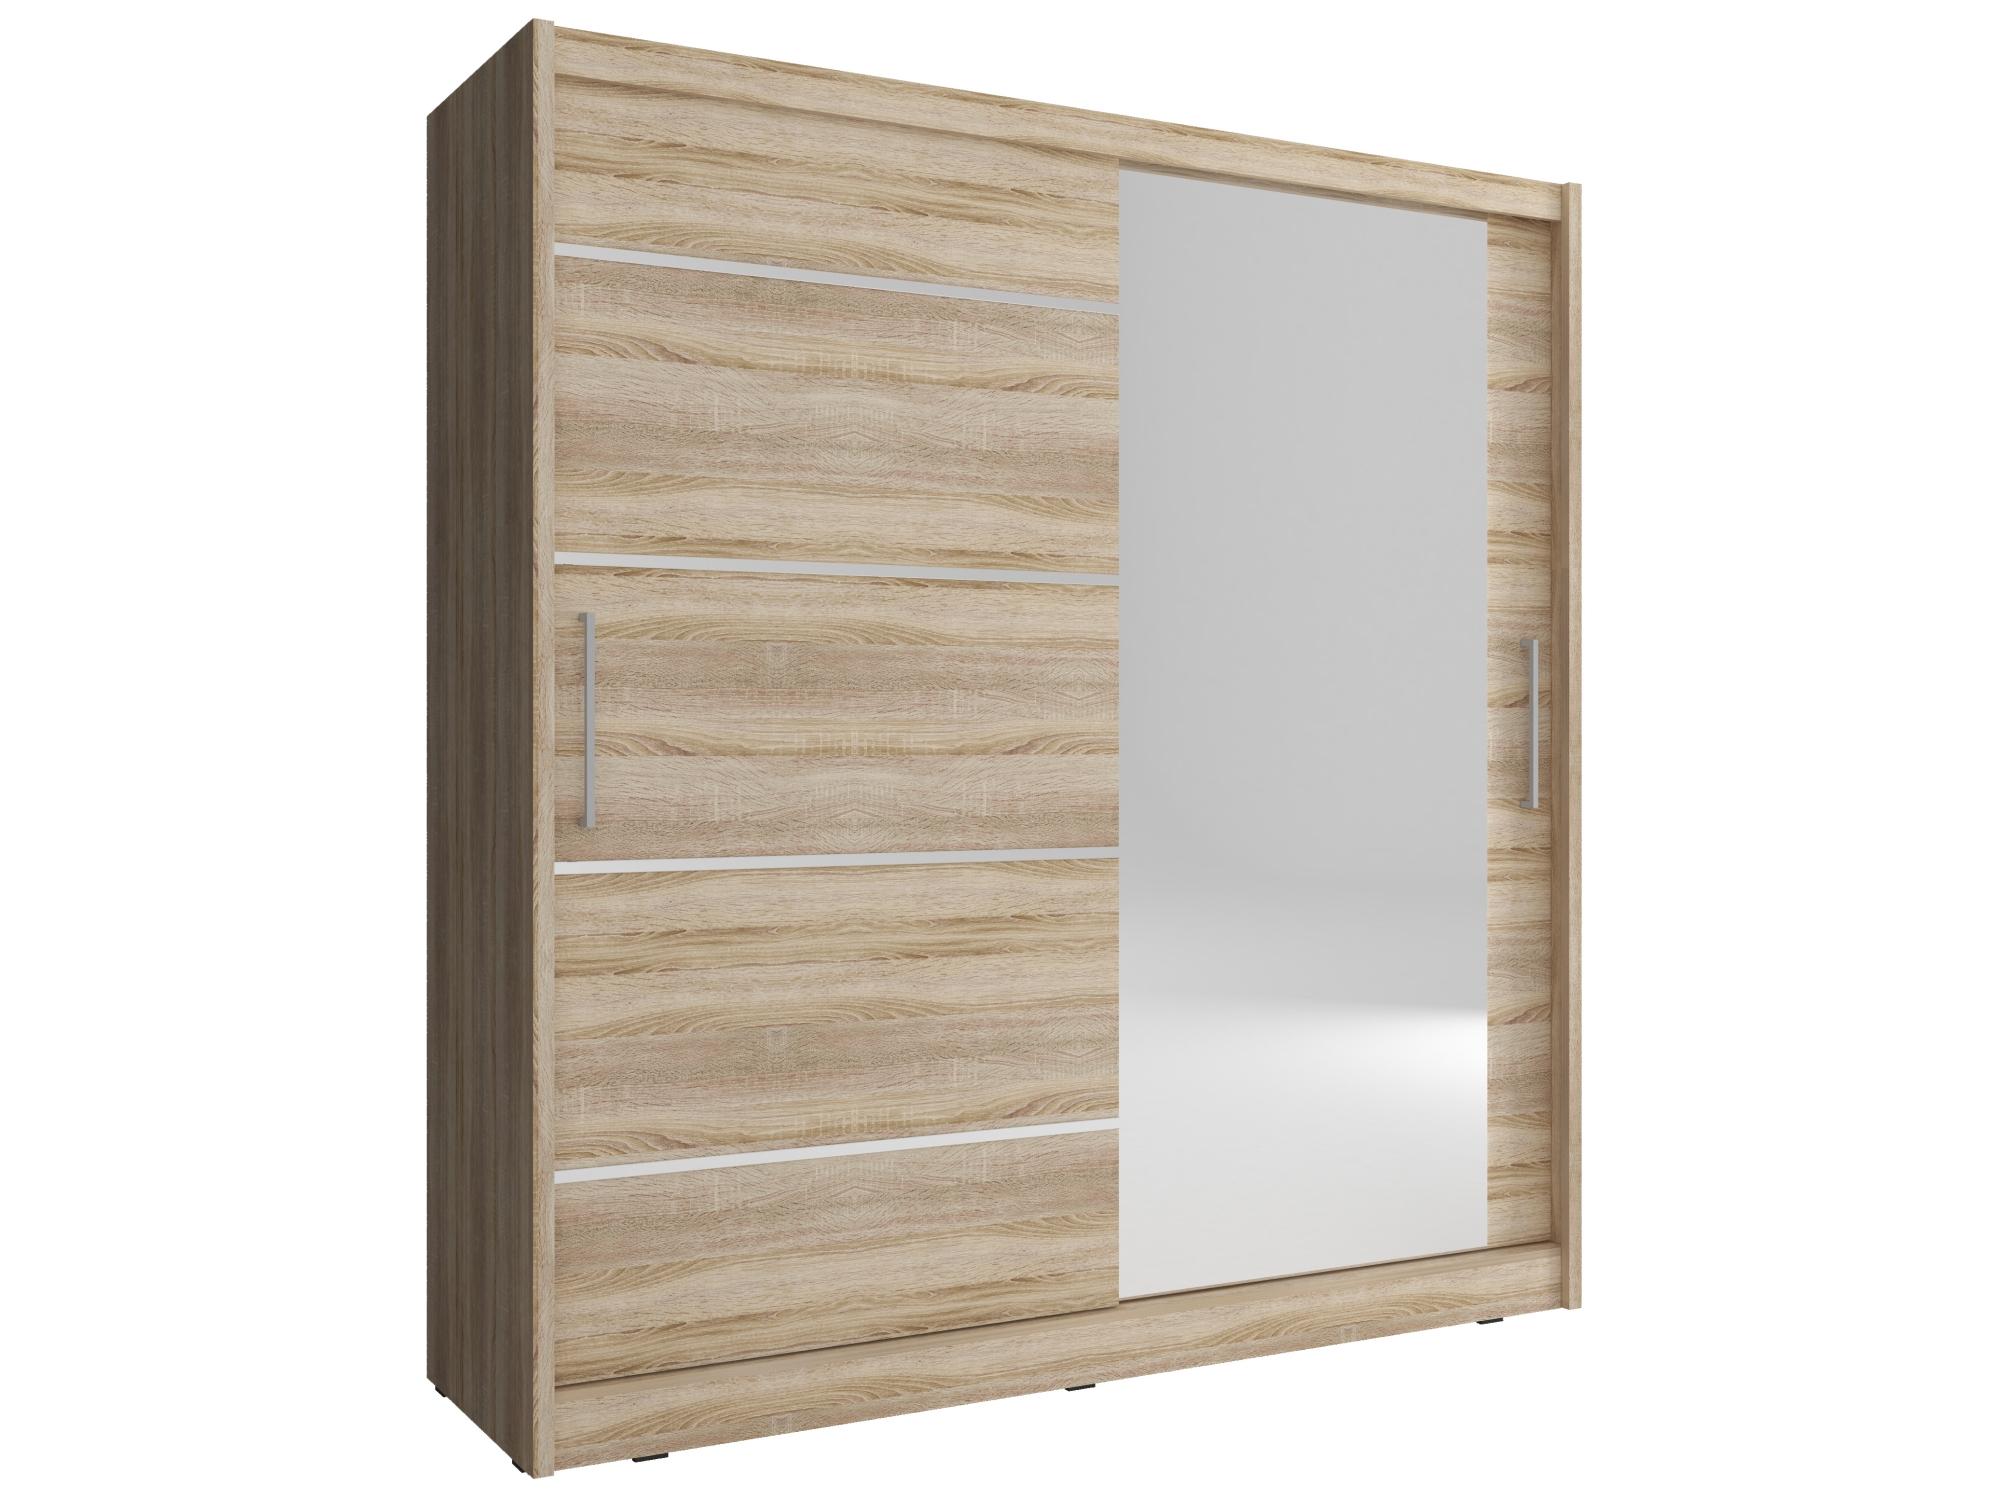 Kombinovaná skříň CONCINNA 1 ALU se zrcadlem 200, dub sonoma